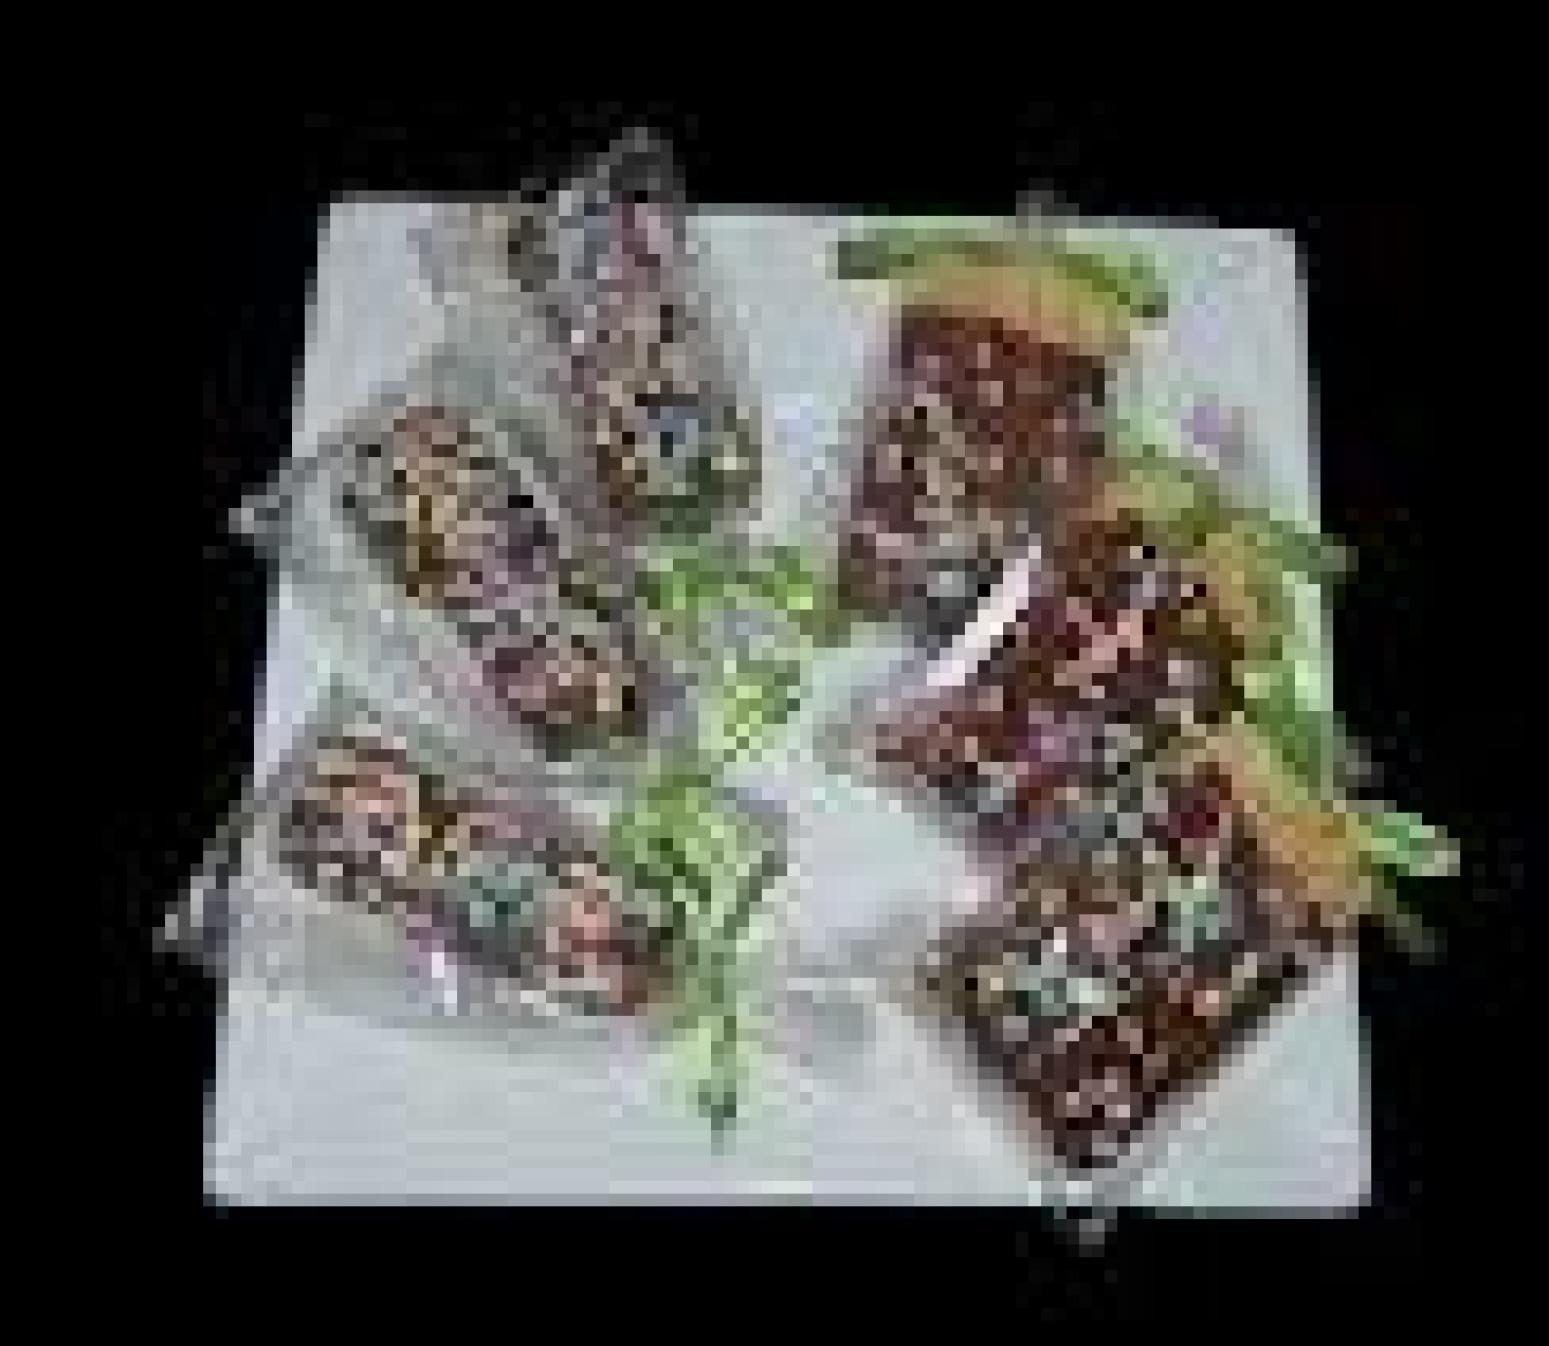 Rice Krispie Treat (Dipped in Chocolate) Recipe